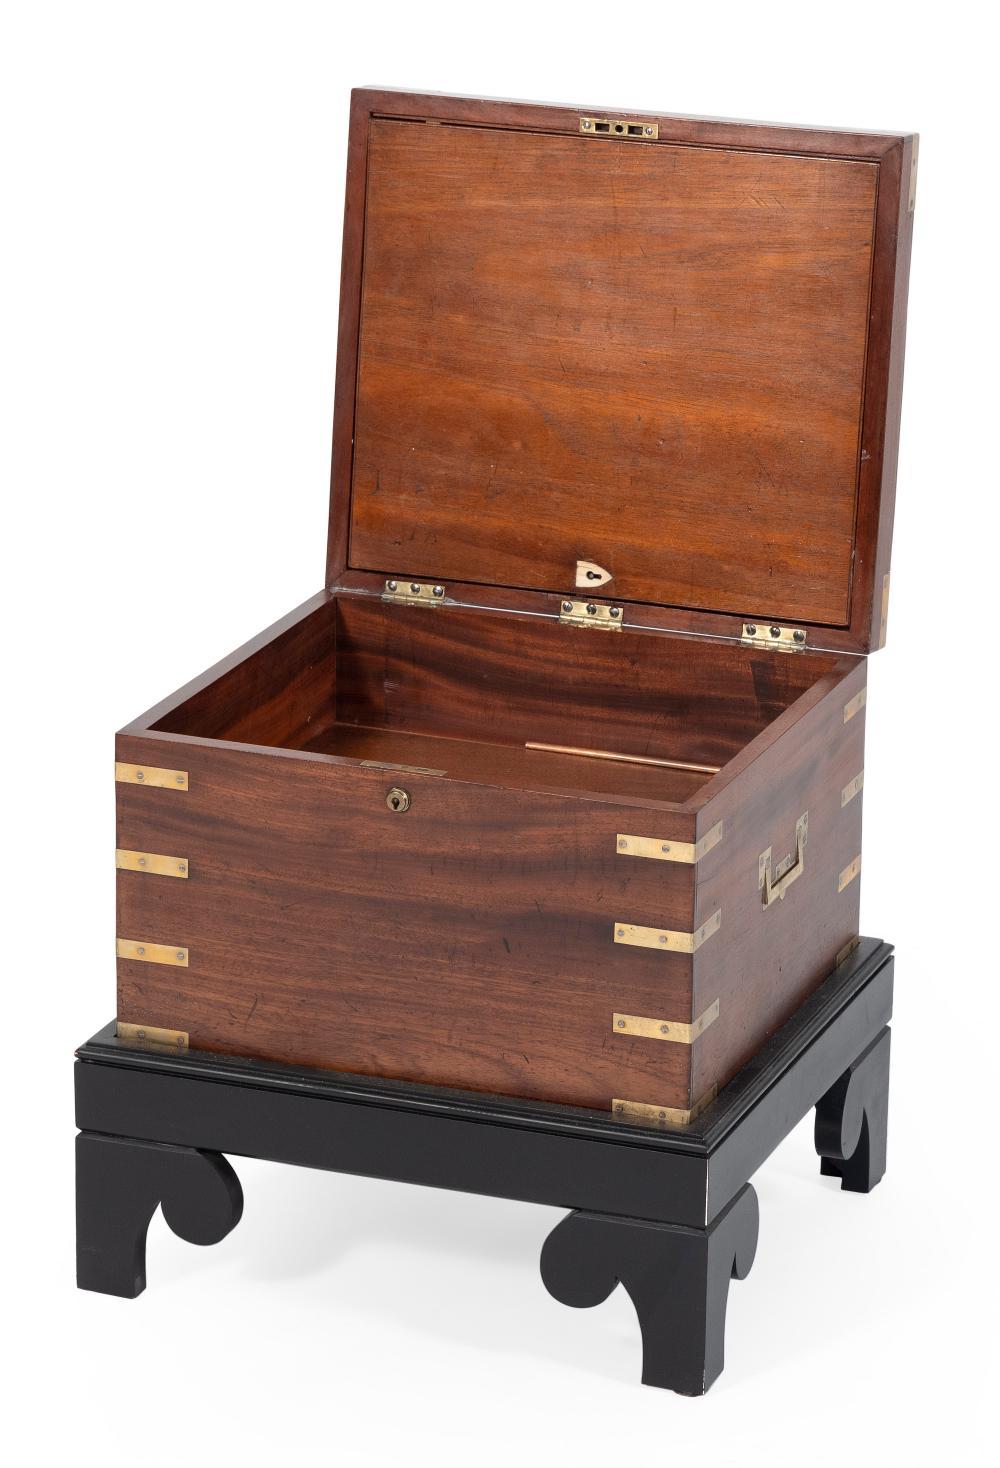 ENGLISH CAMPAIGN BOX 19th Century Height 9.75